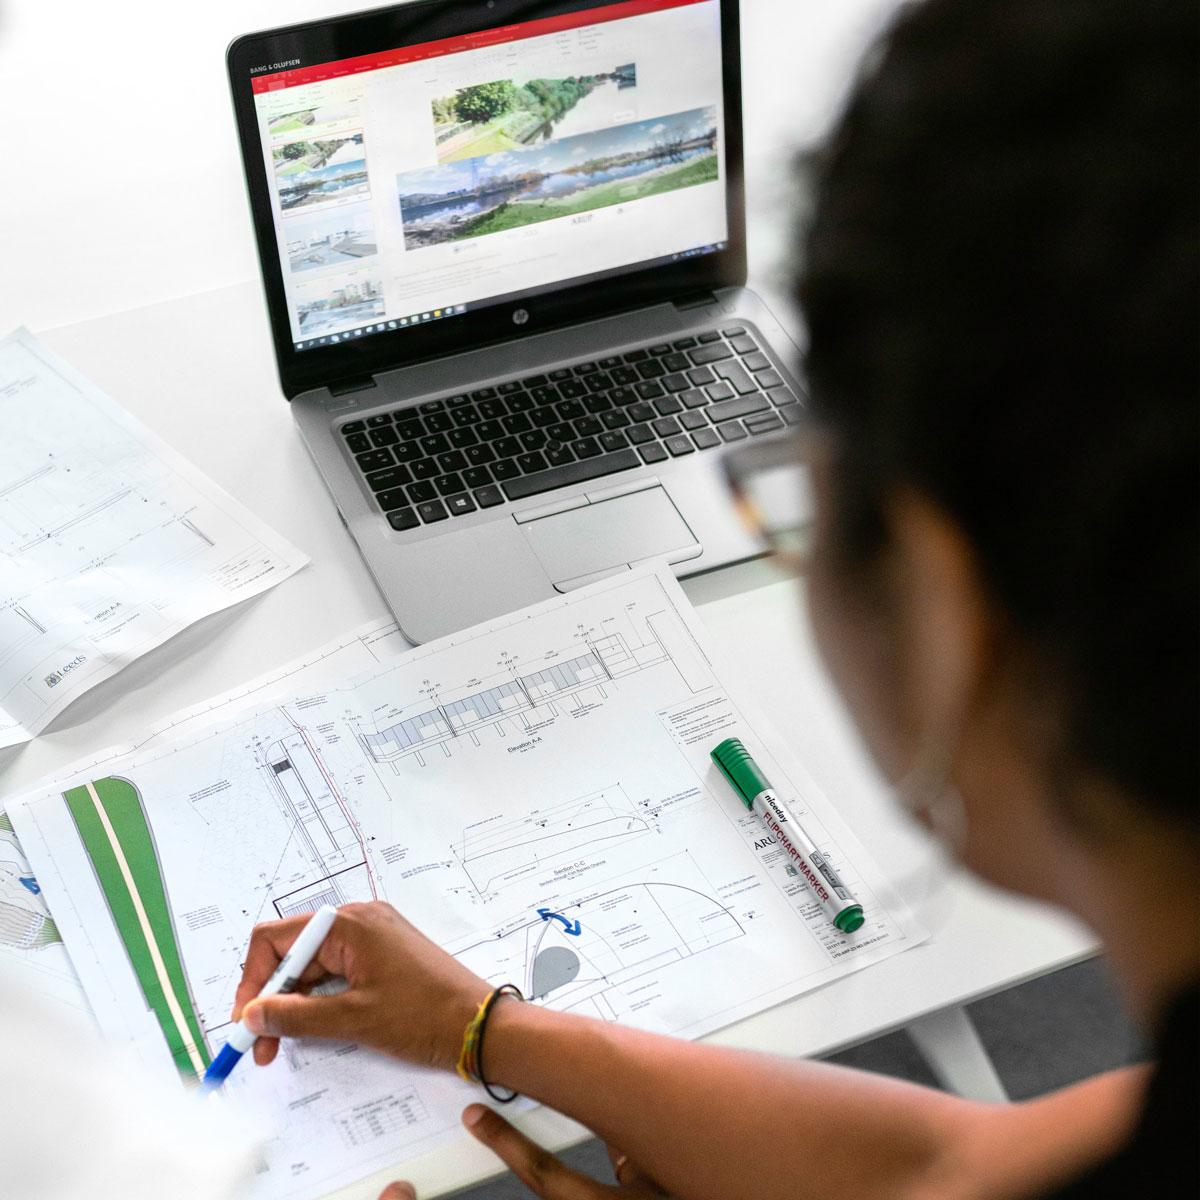 https://www.finemountainconsulting.com/wp-content/uploads/2020/03/blueprinting-square.jpg